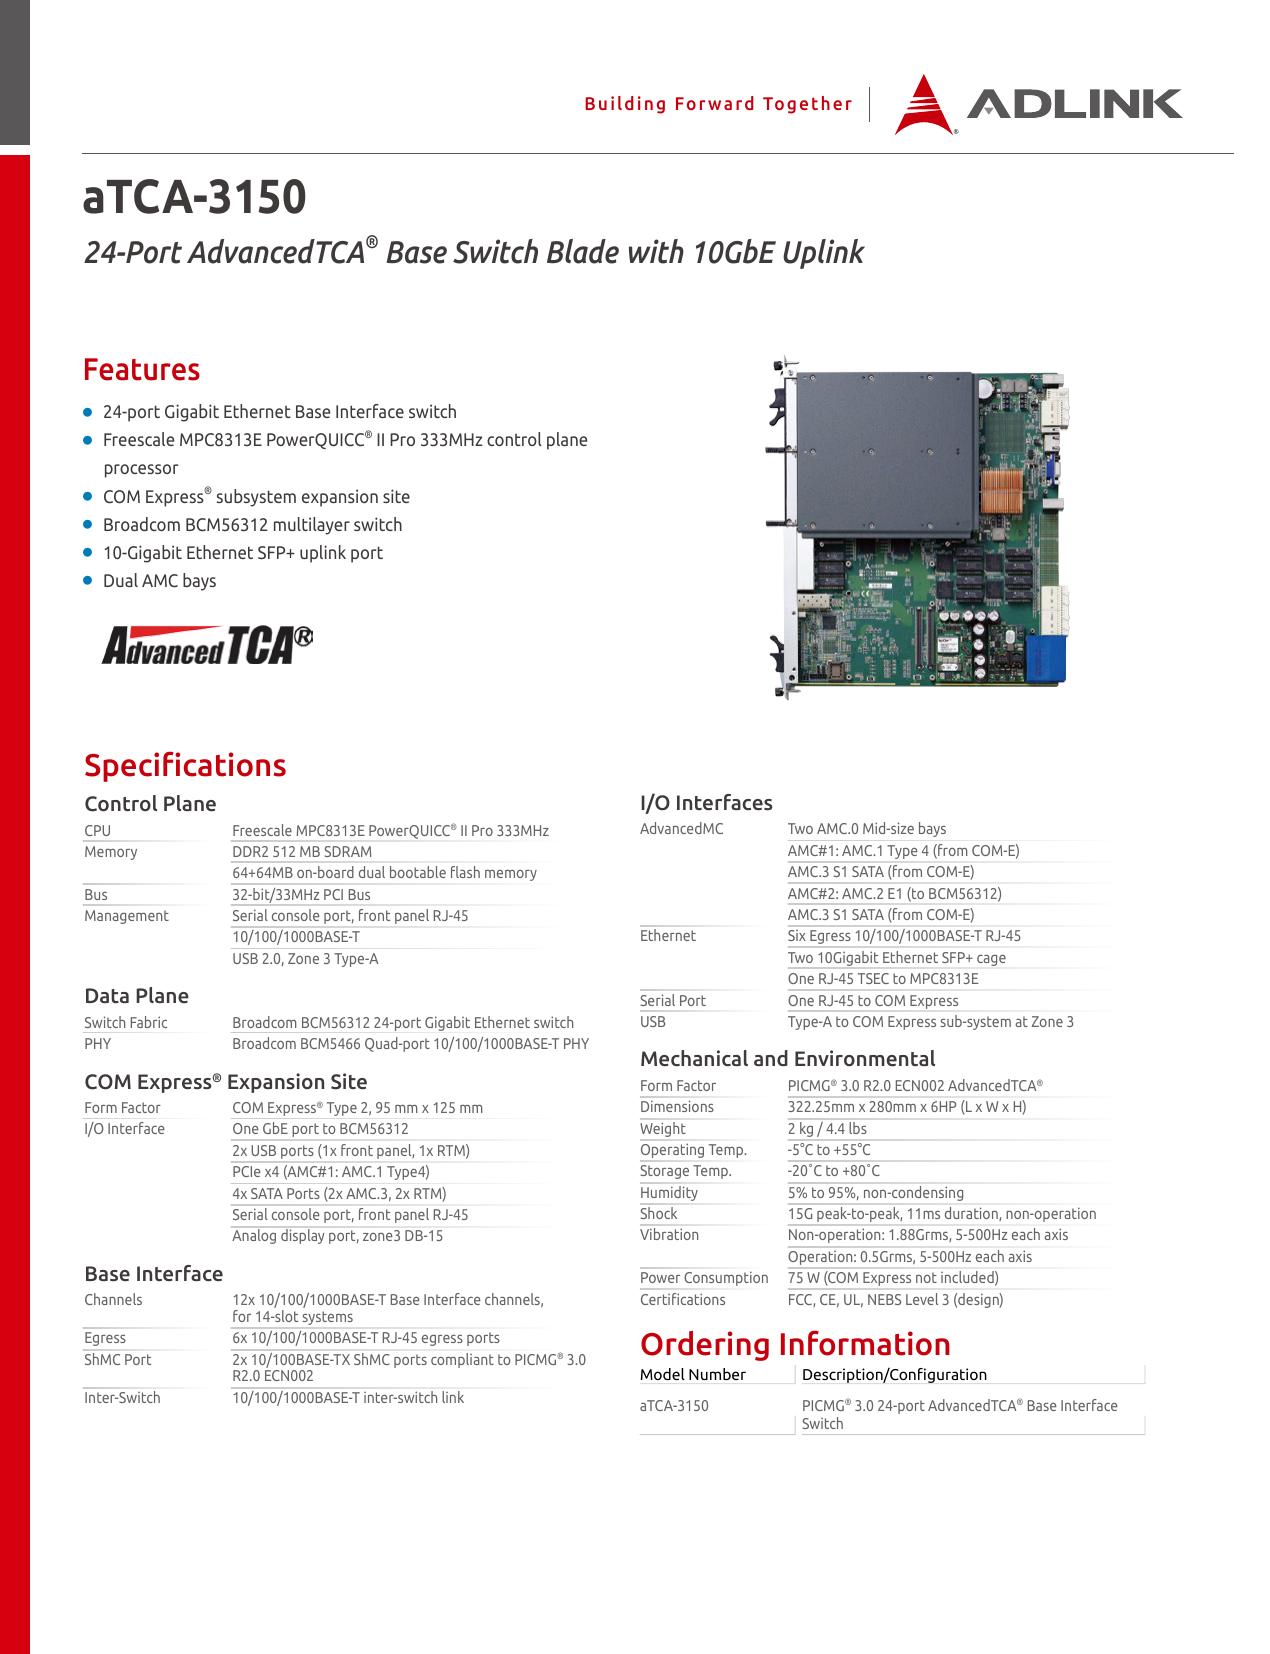 aTCA-3150 - ADLINK Technology | manualzz com